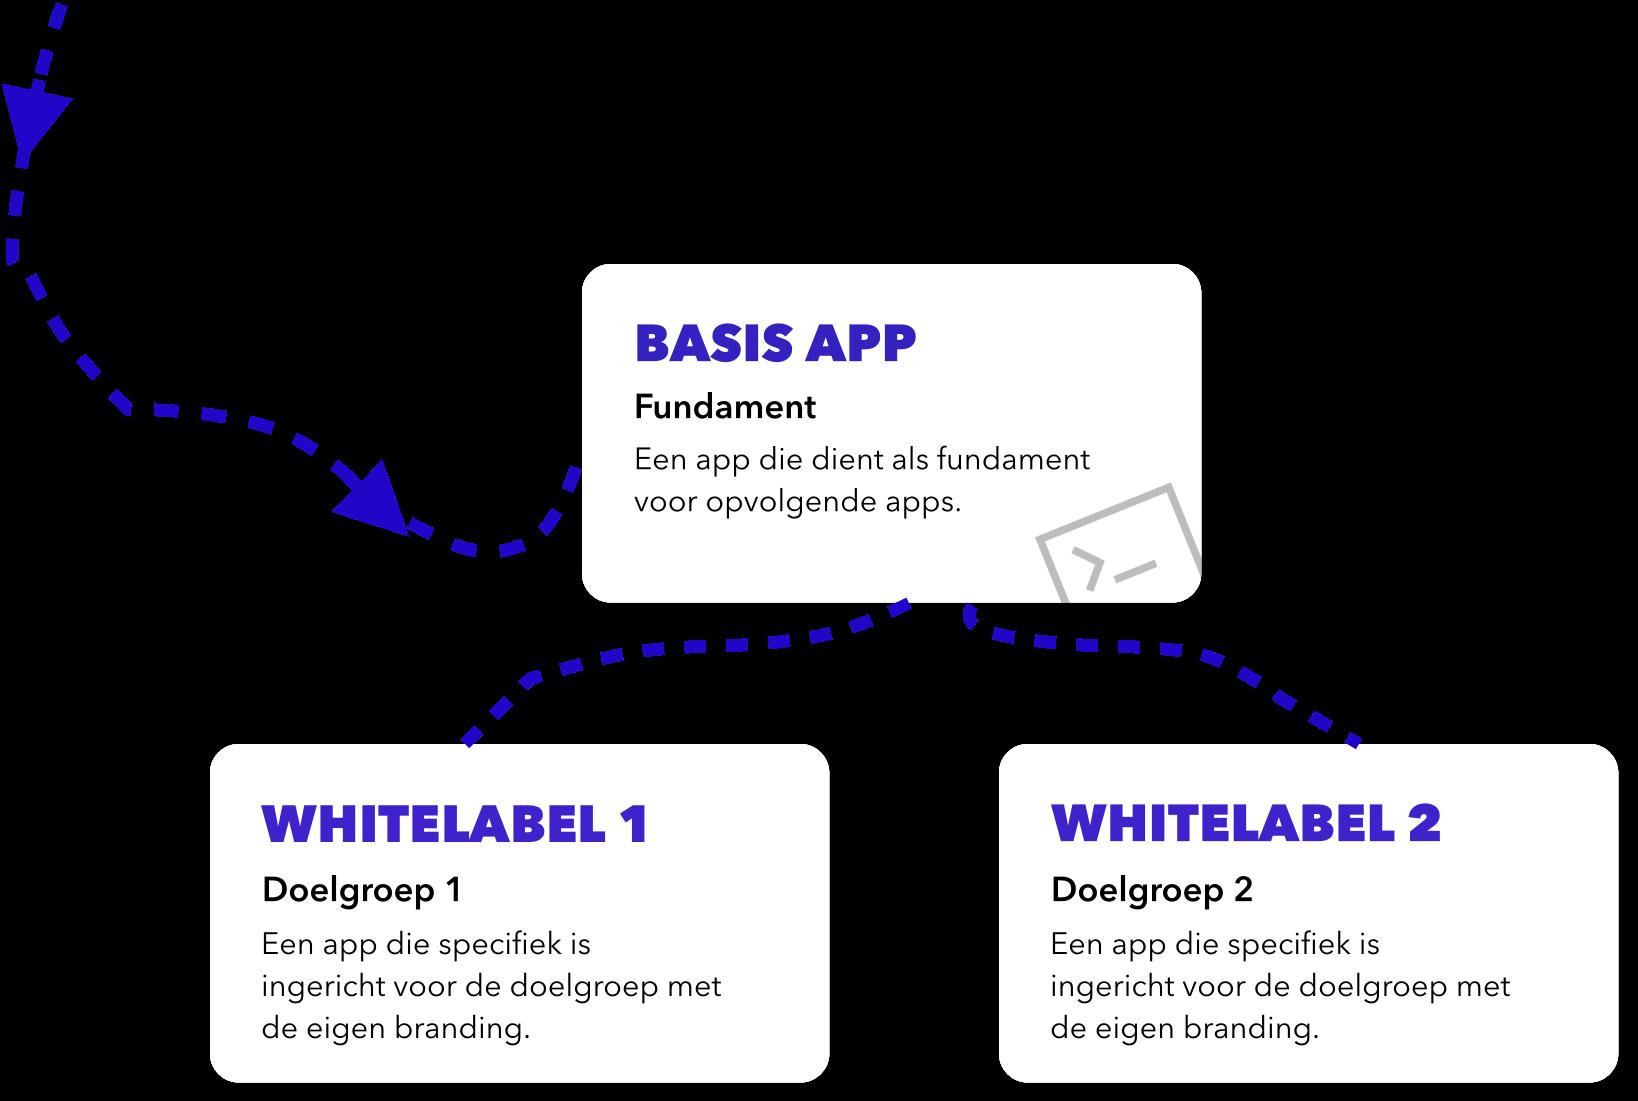 Ontiwikkelproces whitelabel app